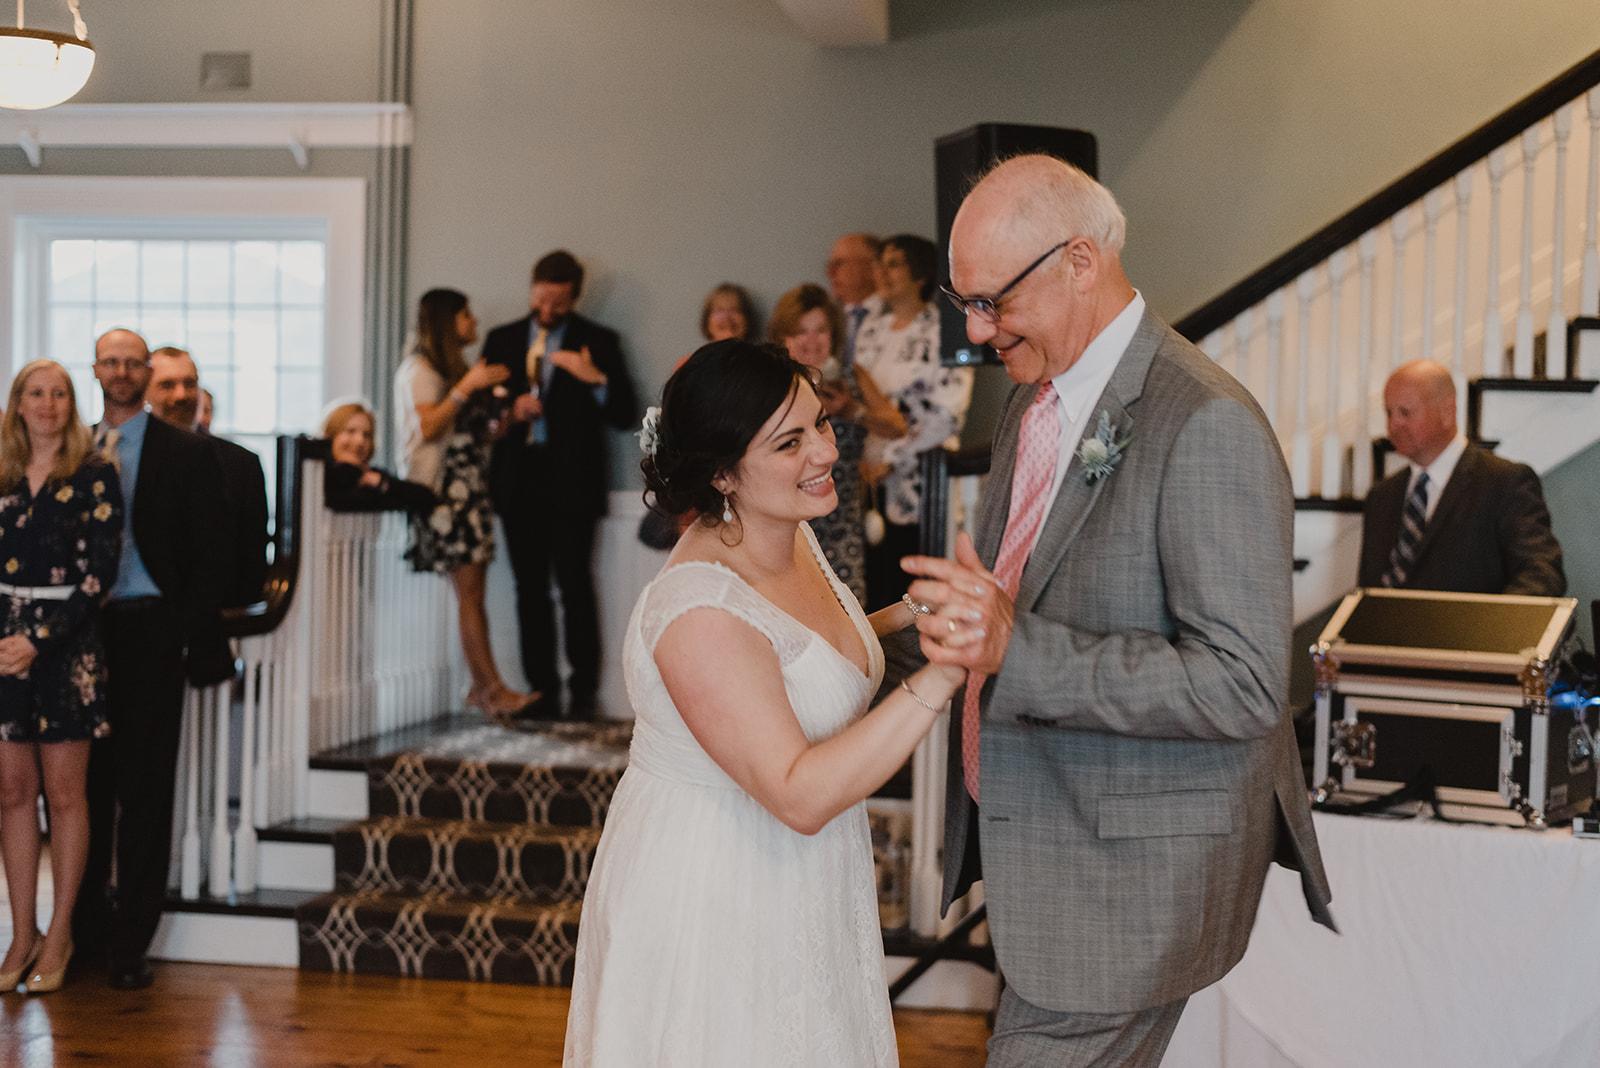 Macdonald_Wedding_ADP_2019-778.jpg